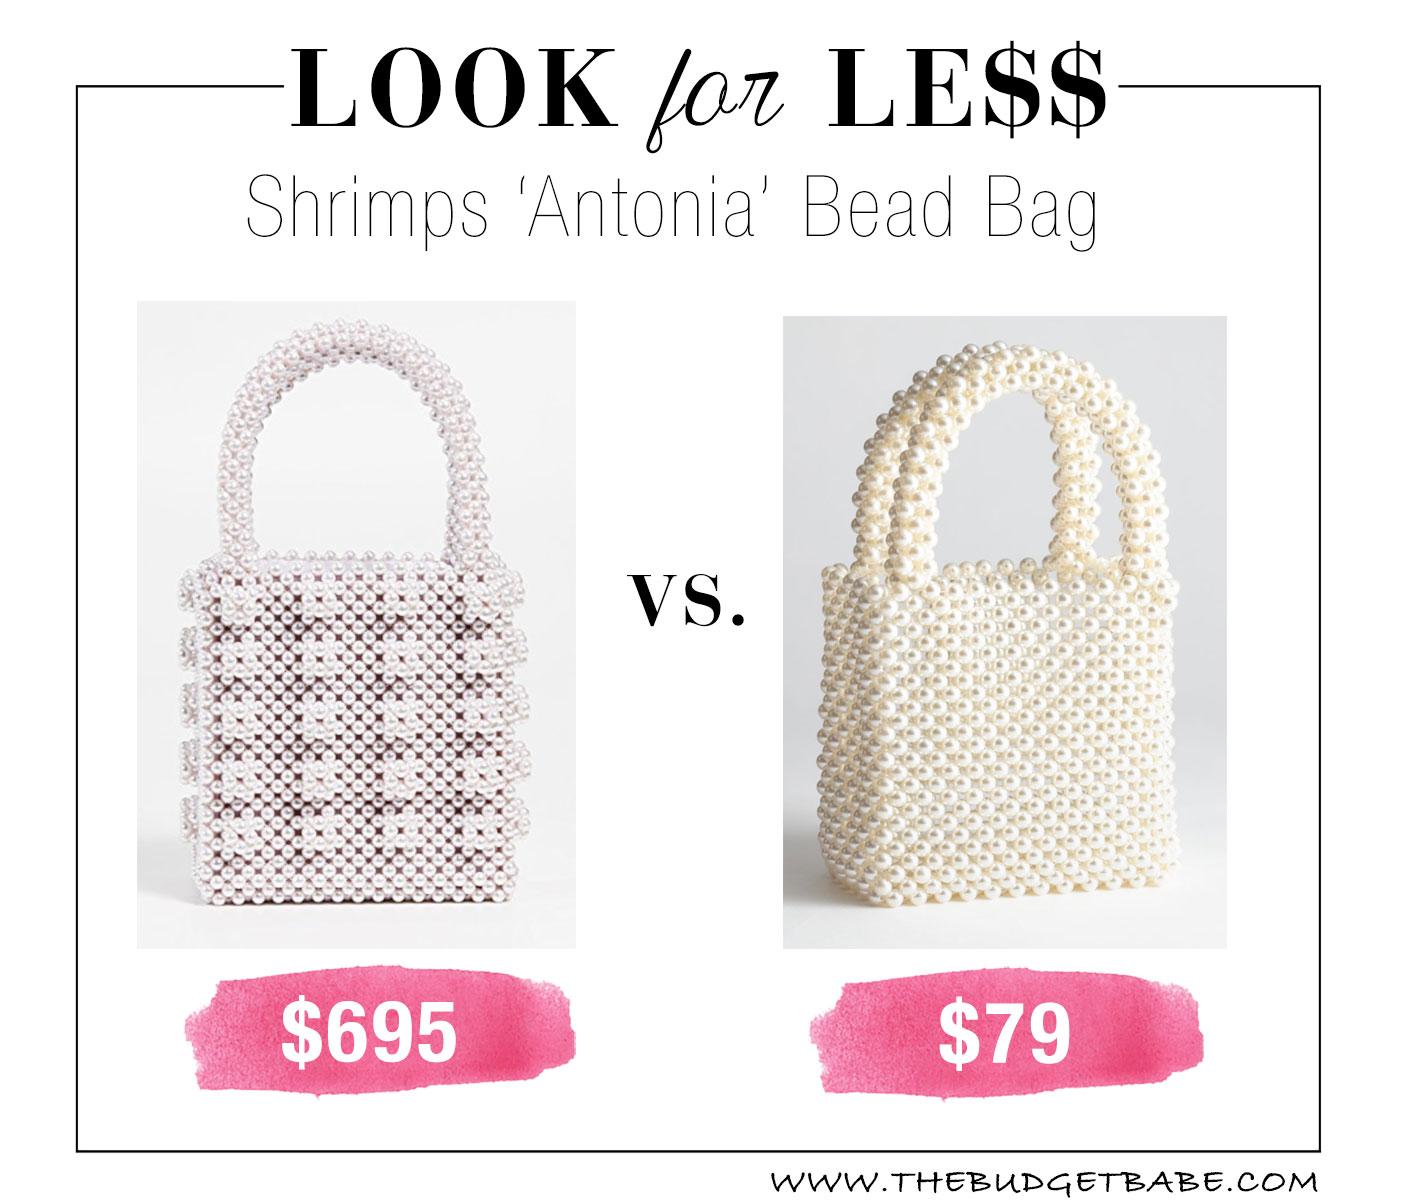 Shrimps Antonia bead bag dupe